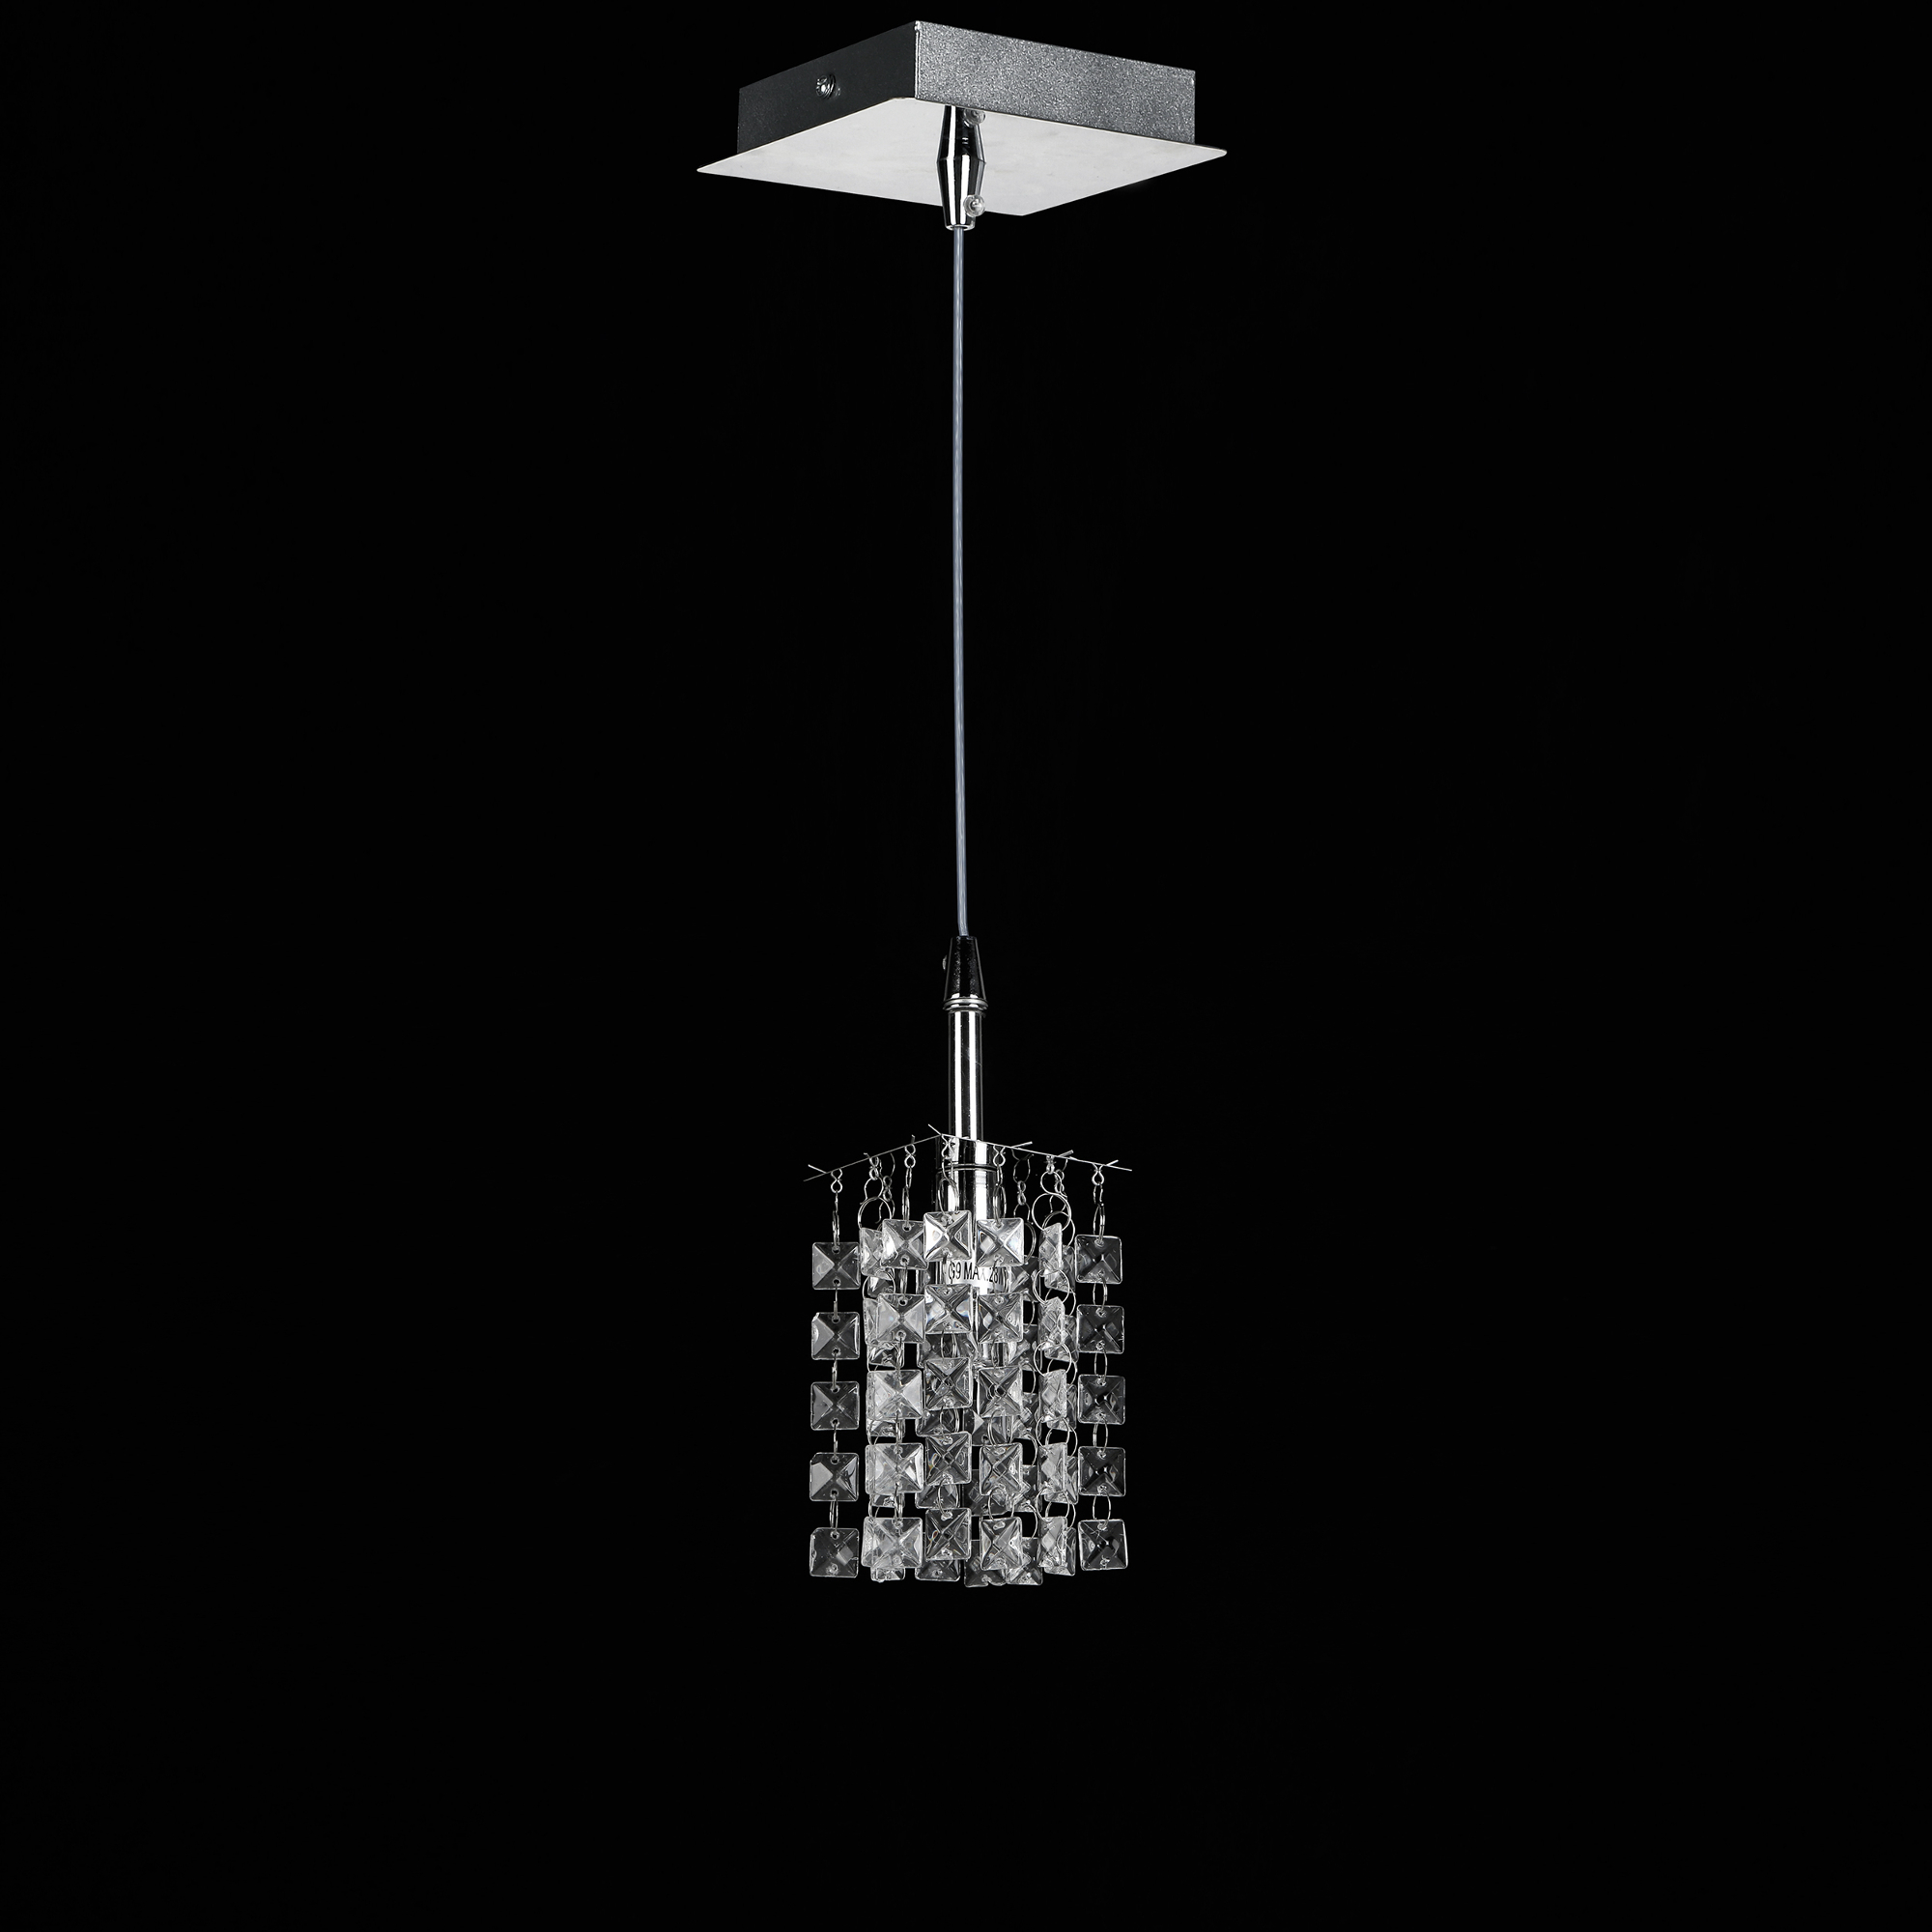 Crystal chandelier 38x38cm ceiling light room lamp chrome ebay - Ceiling crystal chandelier ...